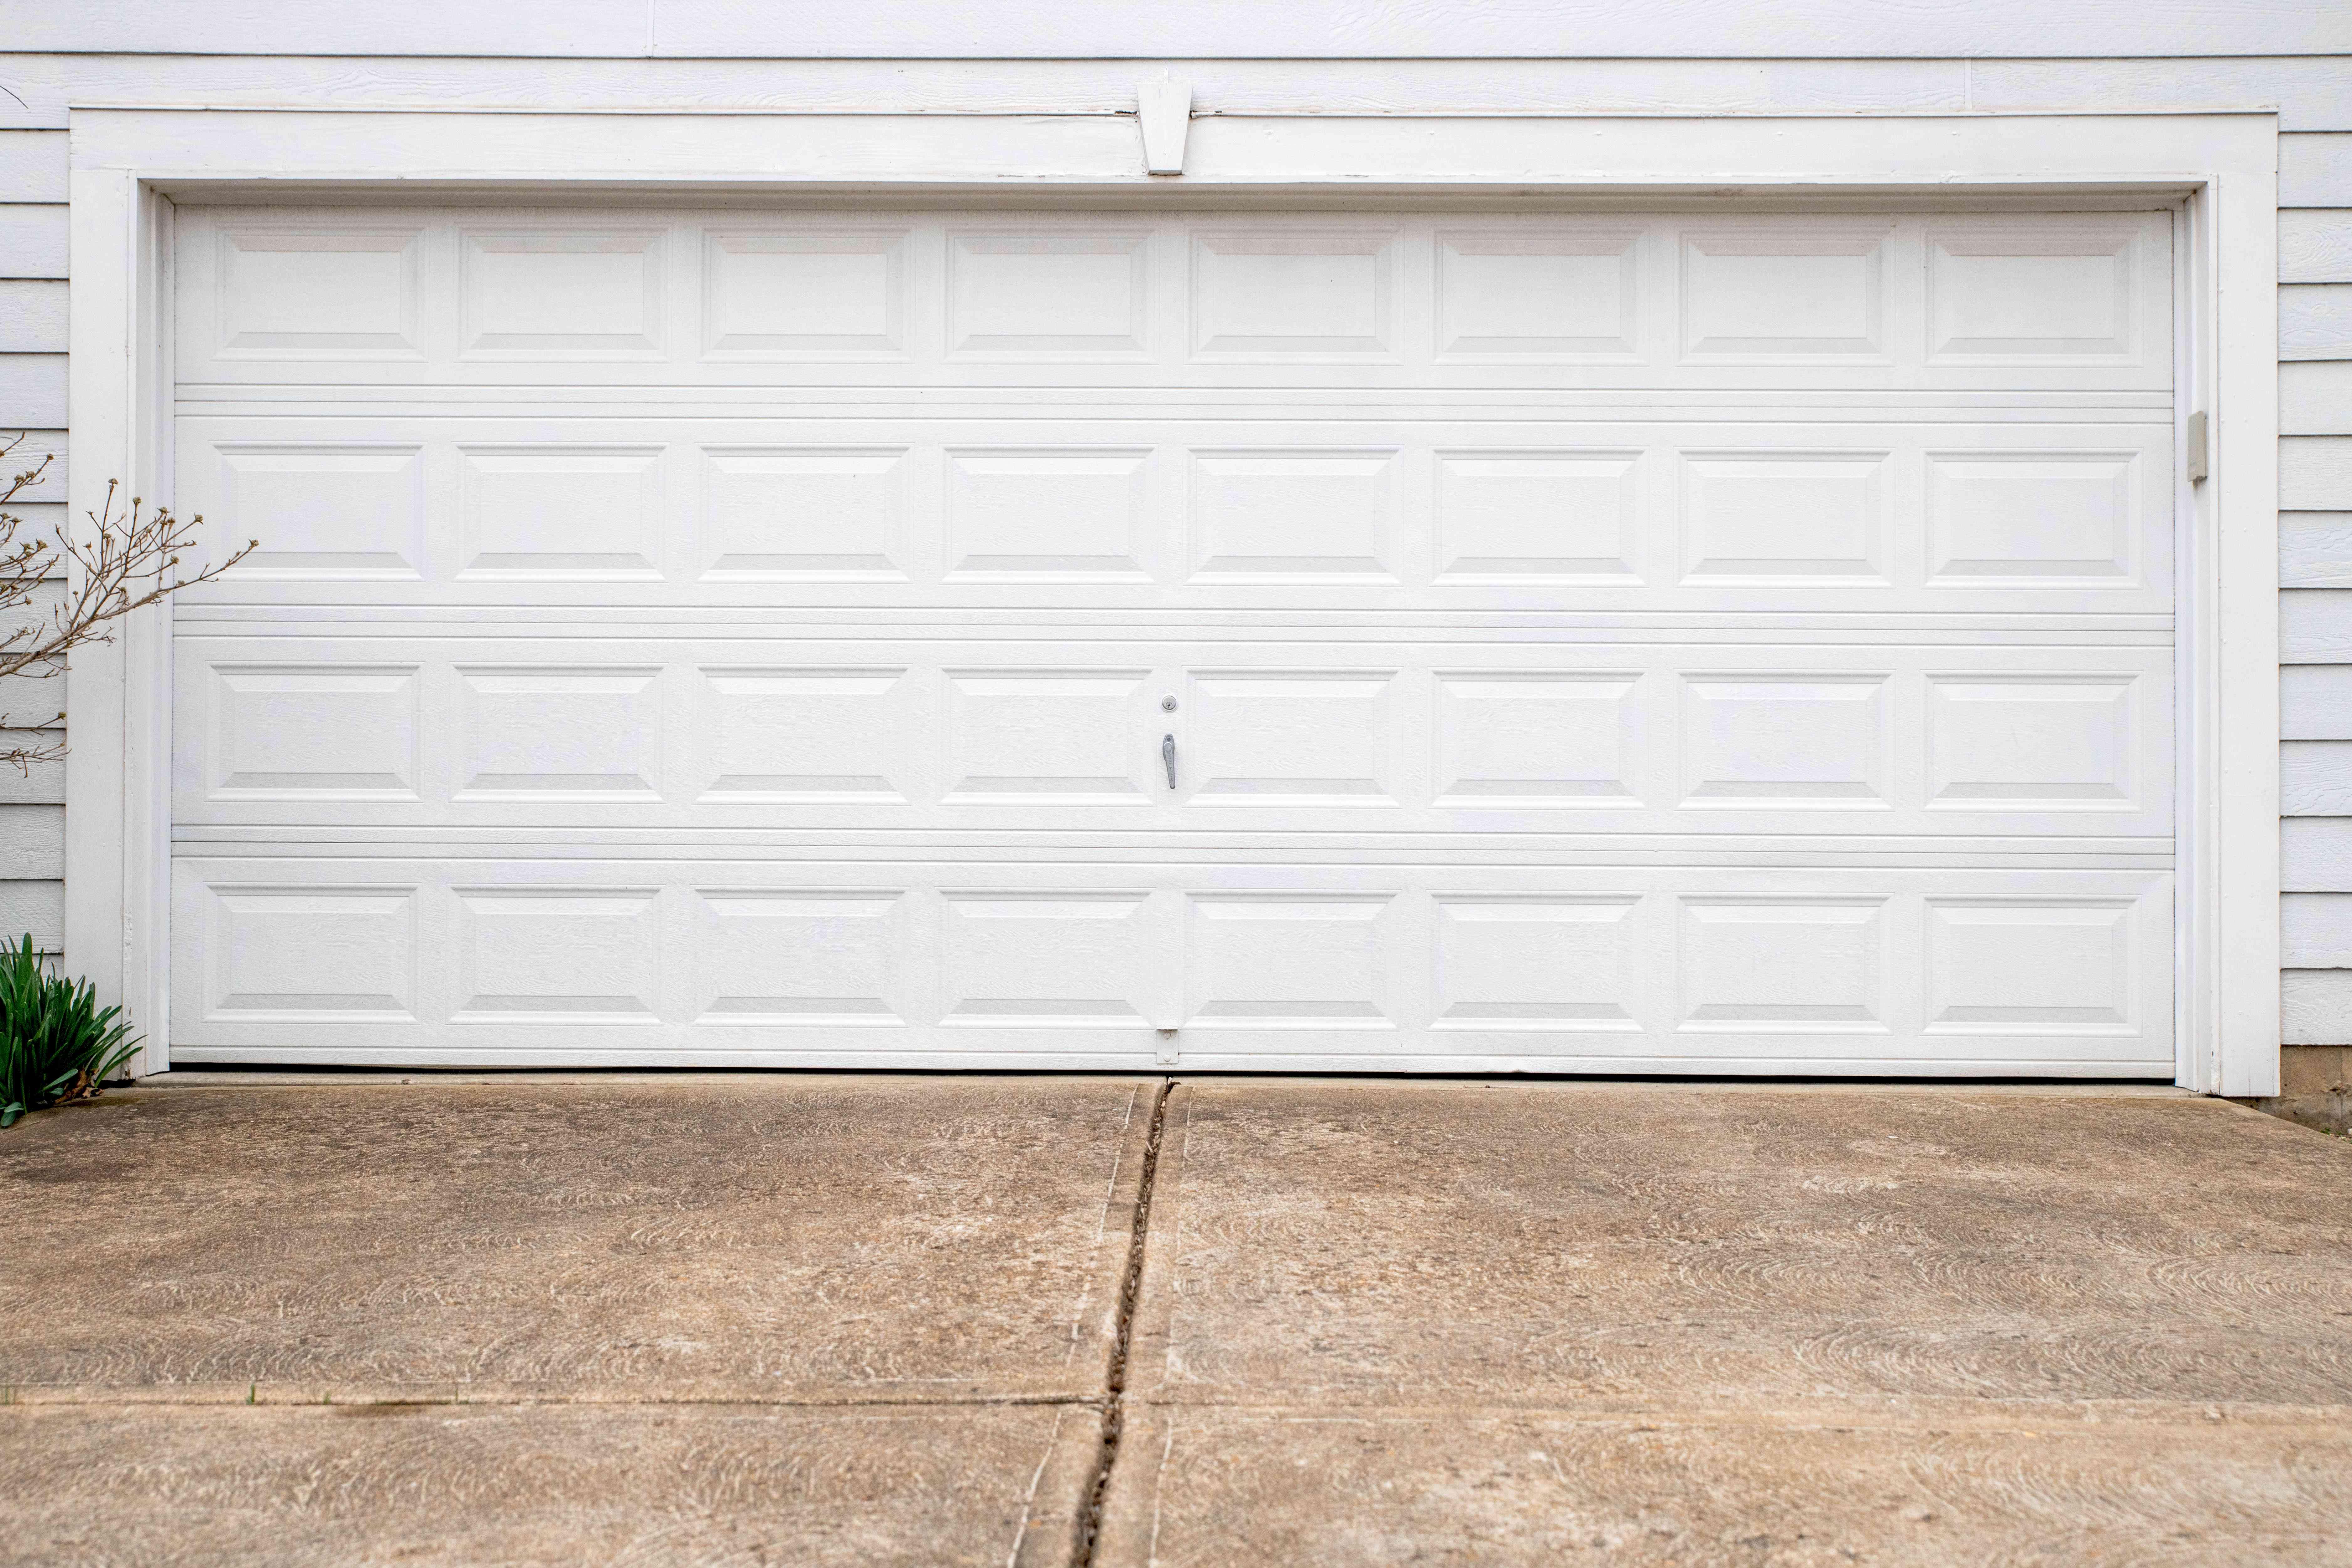 White garage door closed